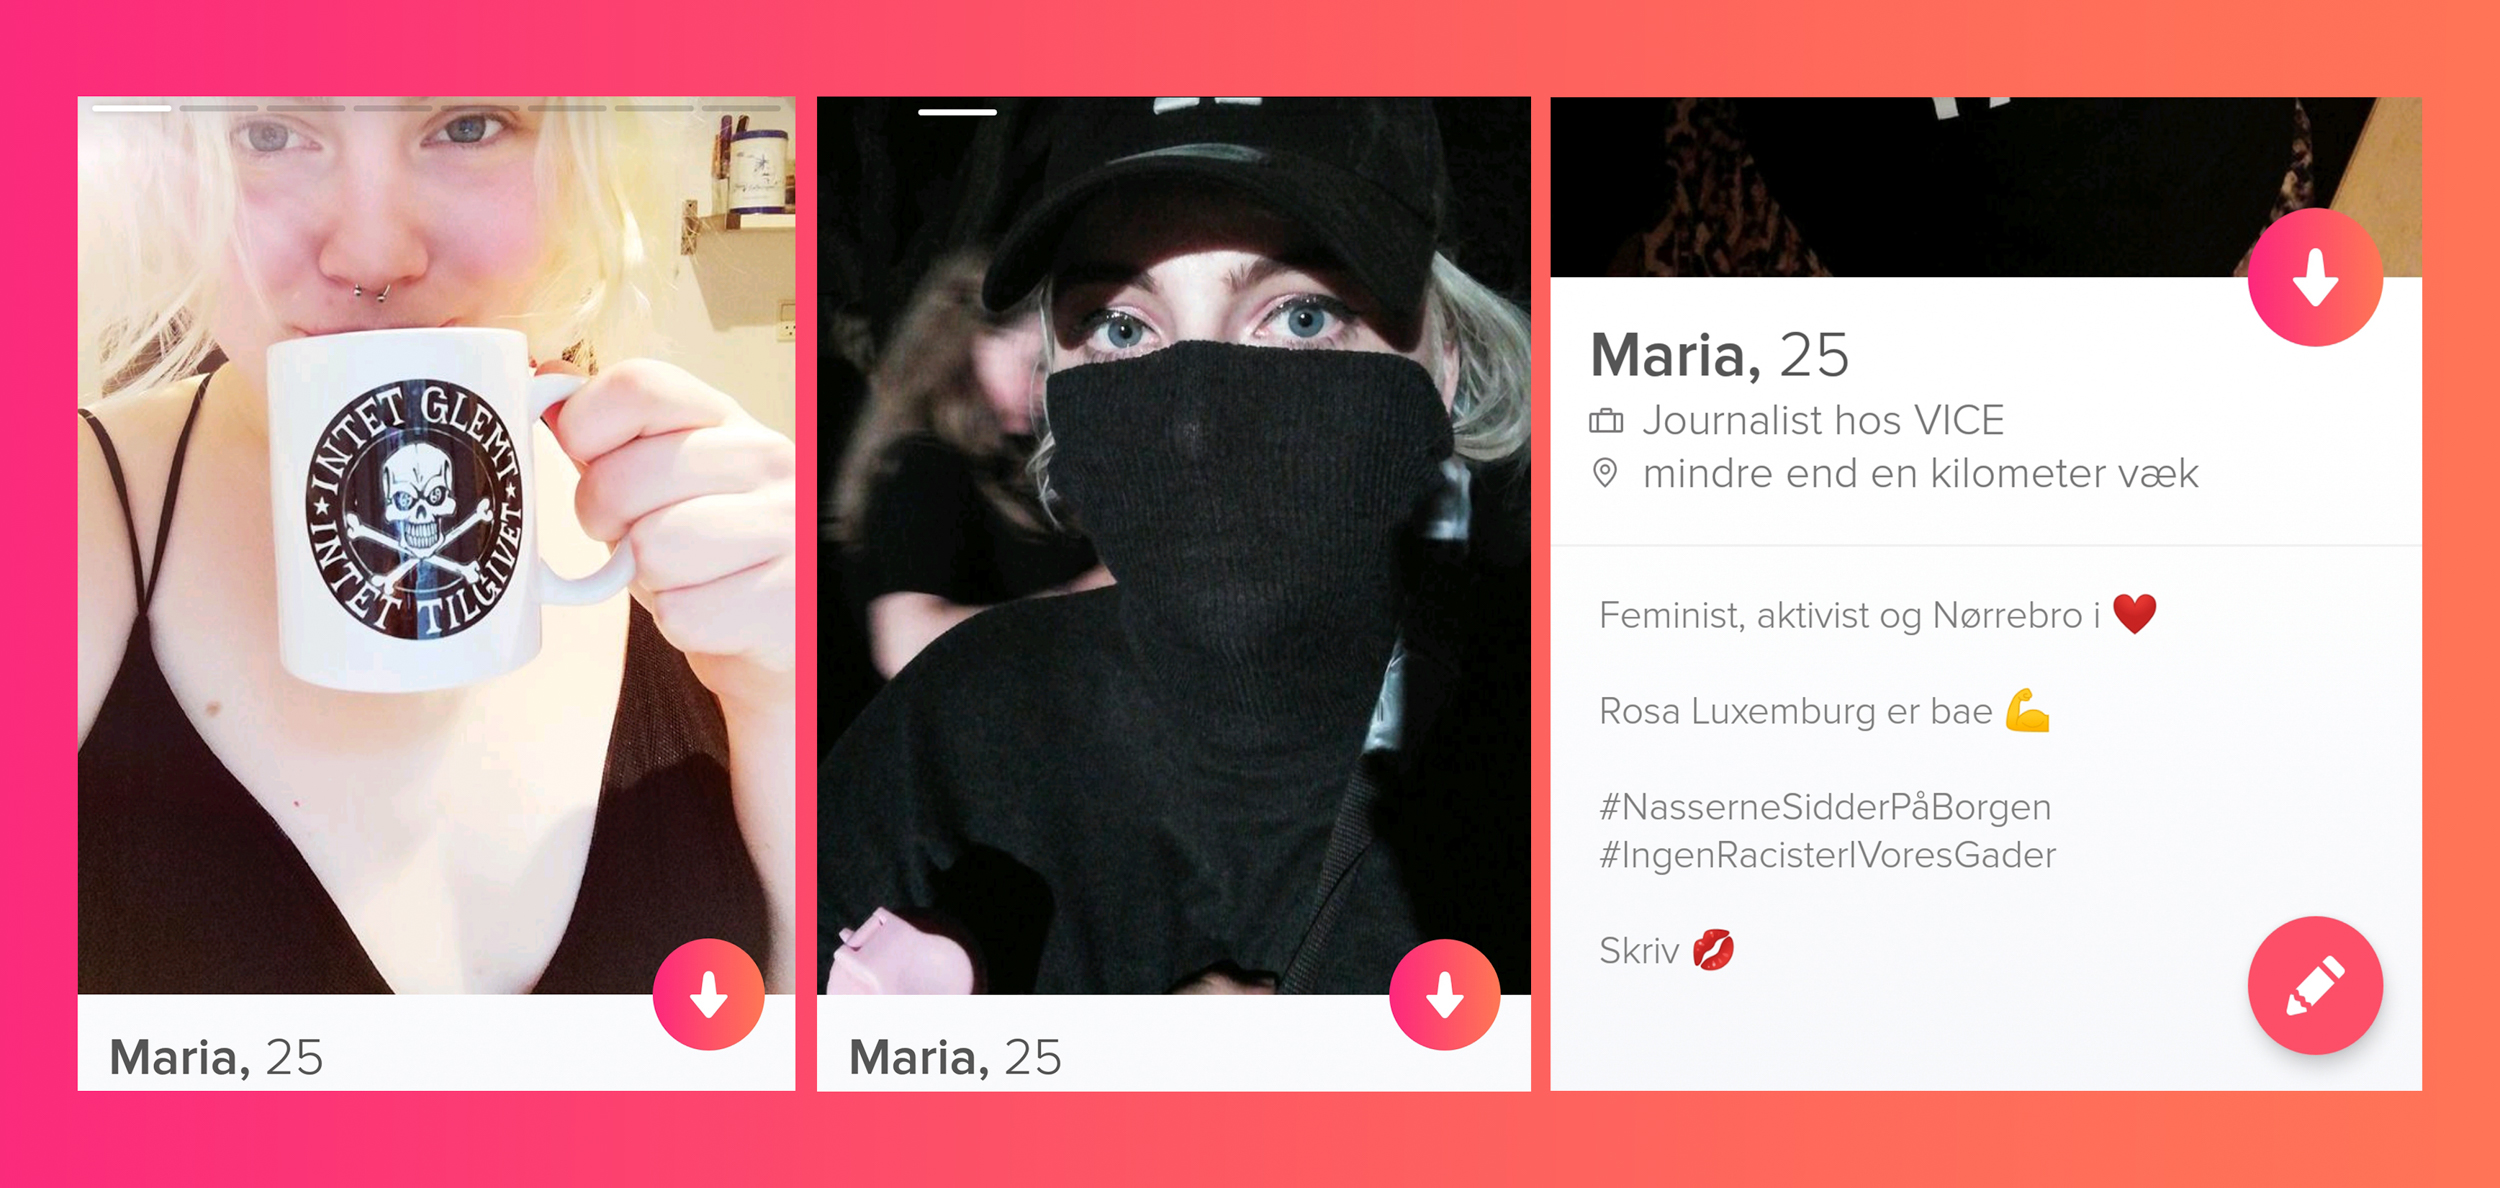 Skriv dating site profil